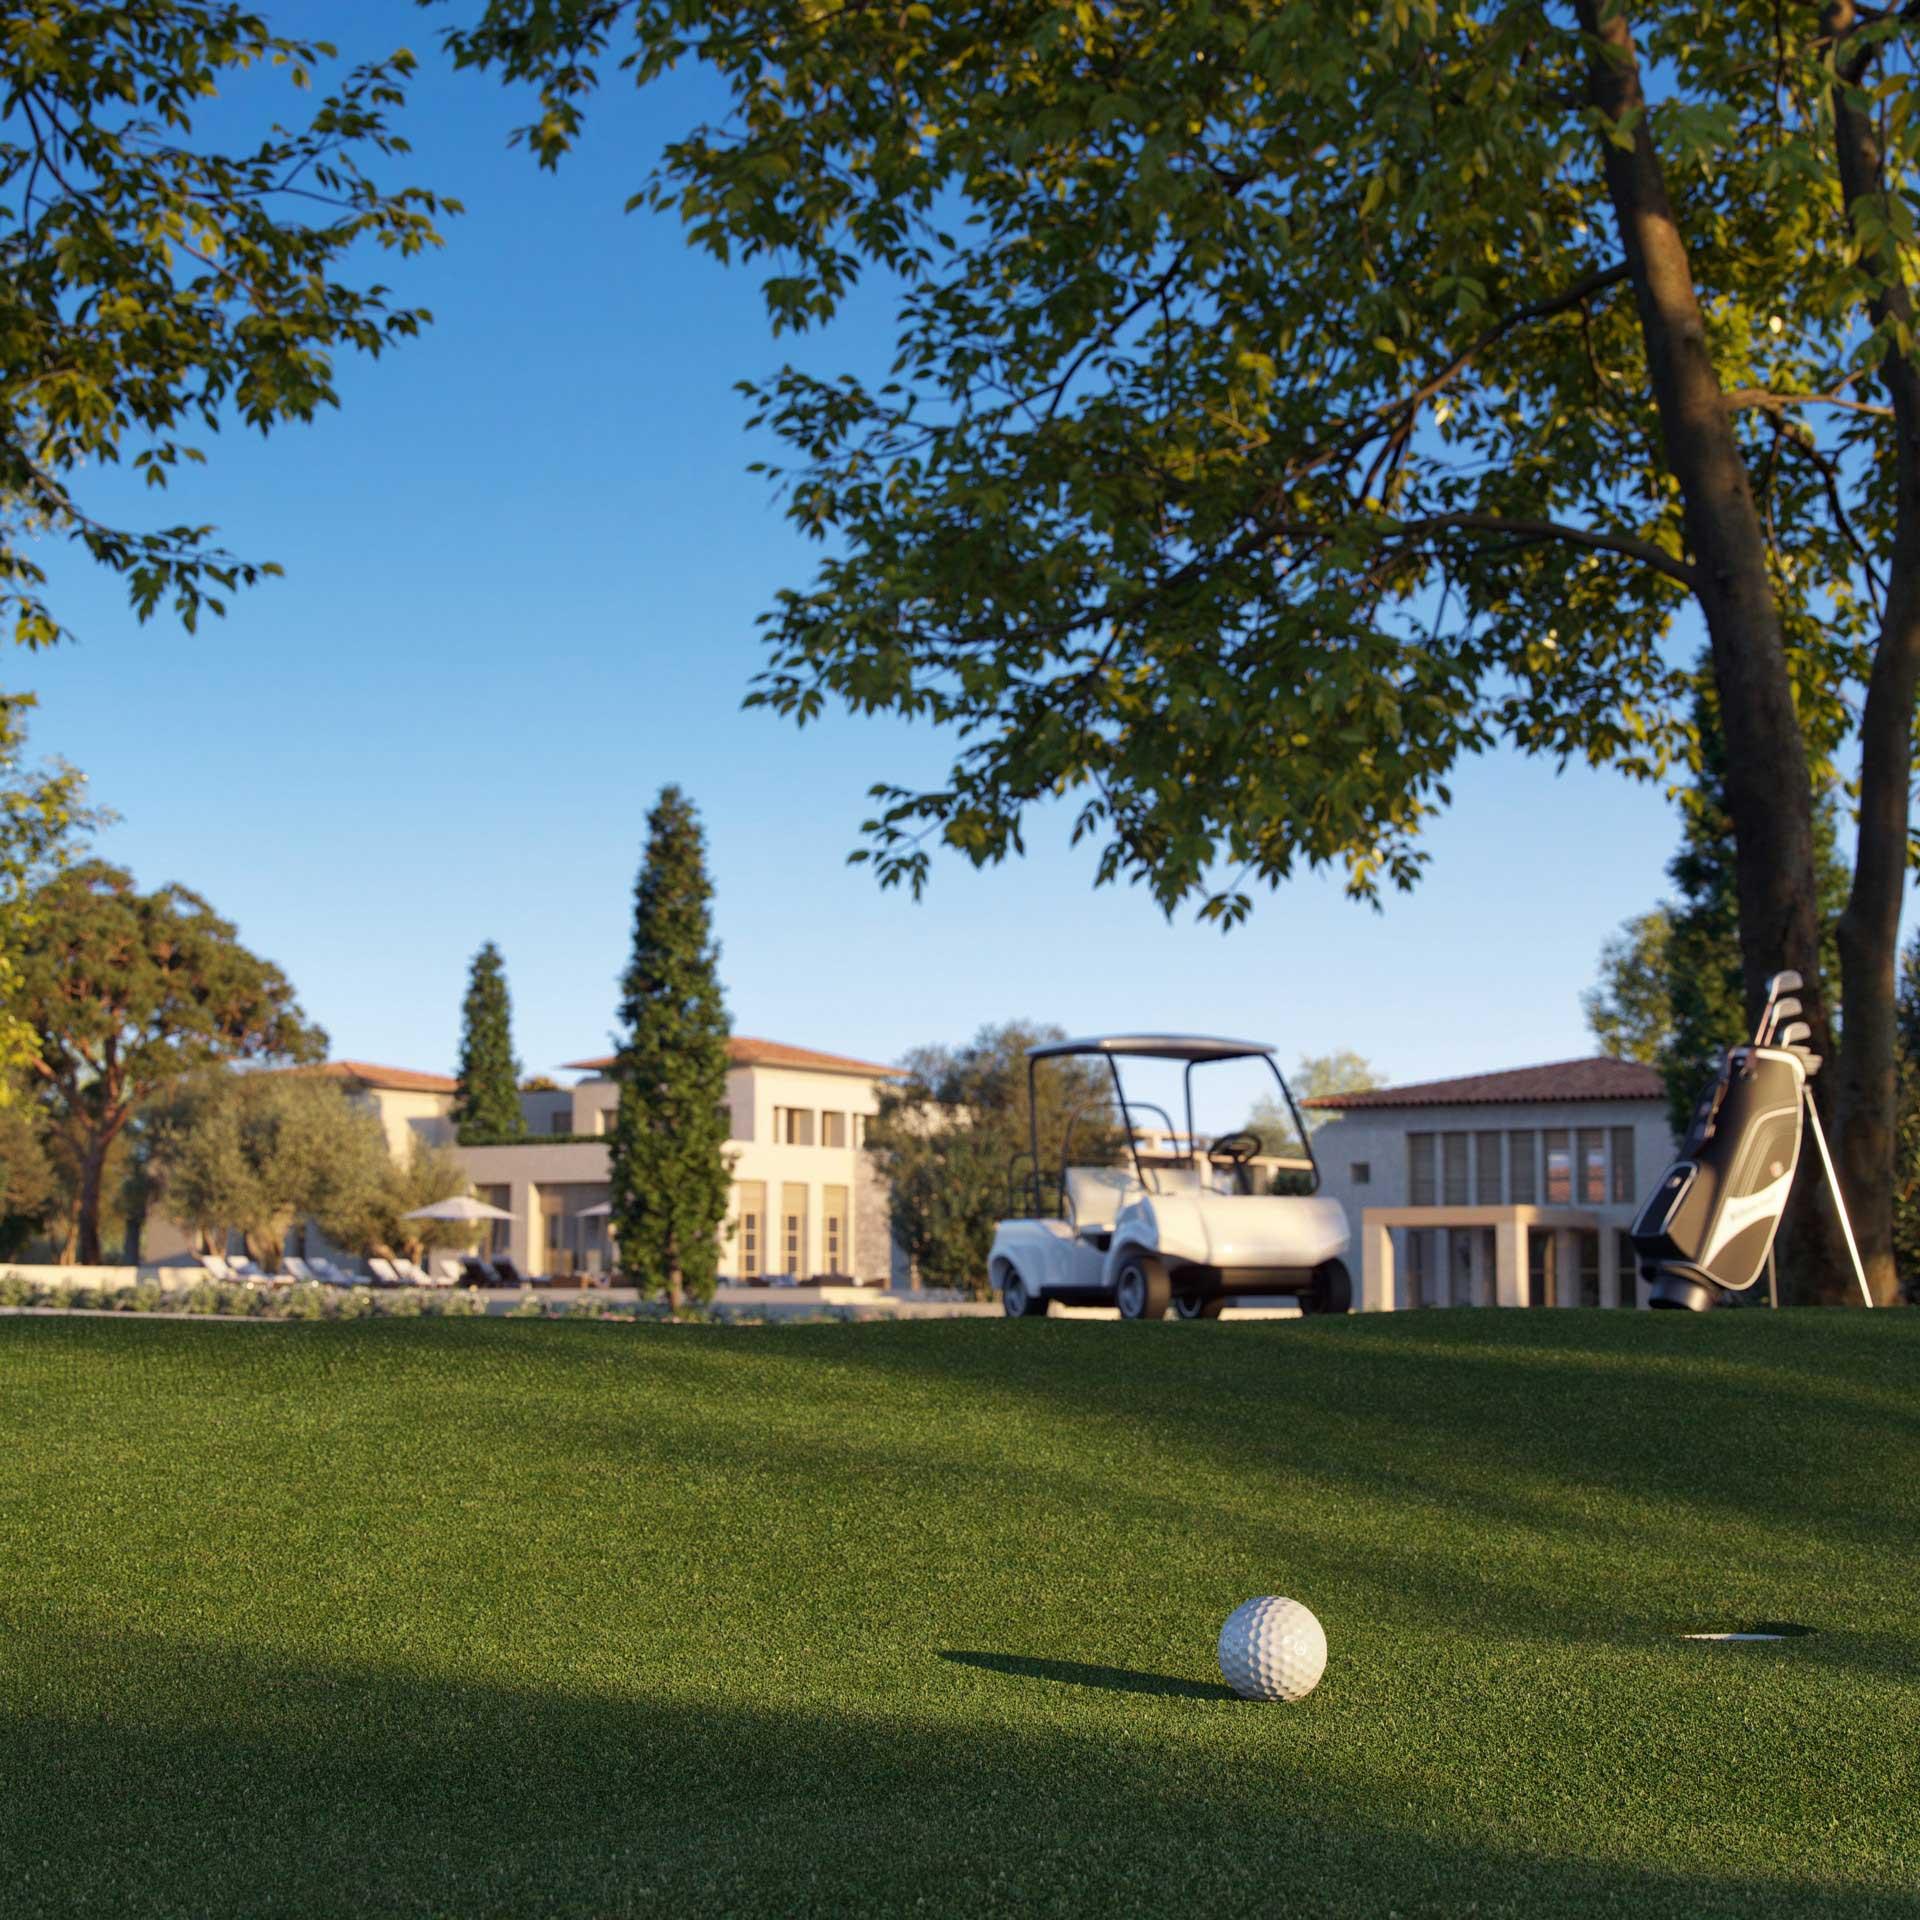 Kilada Country Club